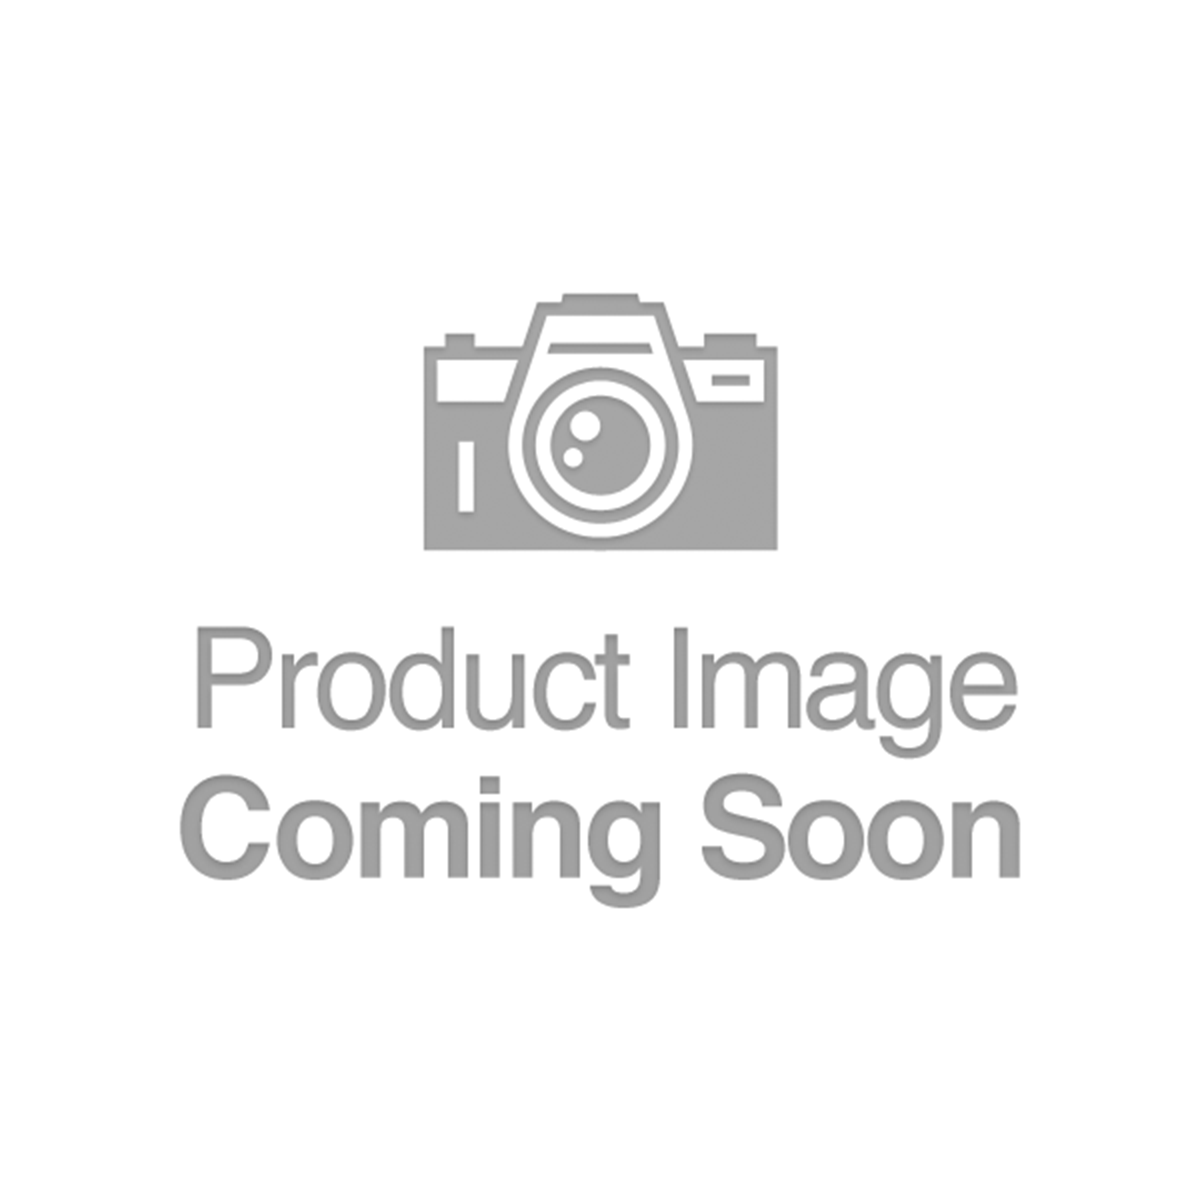 Pittsburgh - Pennsylvania - CH 2278 - FR 552 - PCGS 63 PPQ